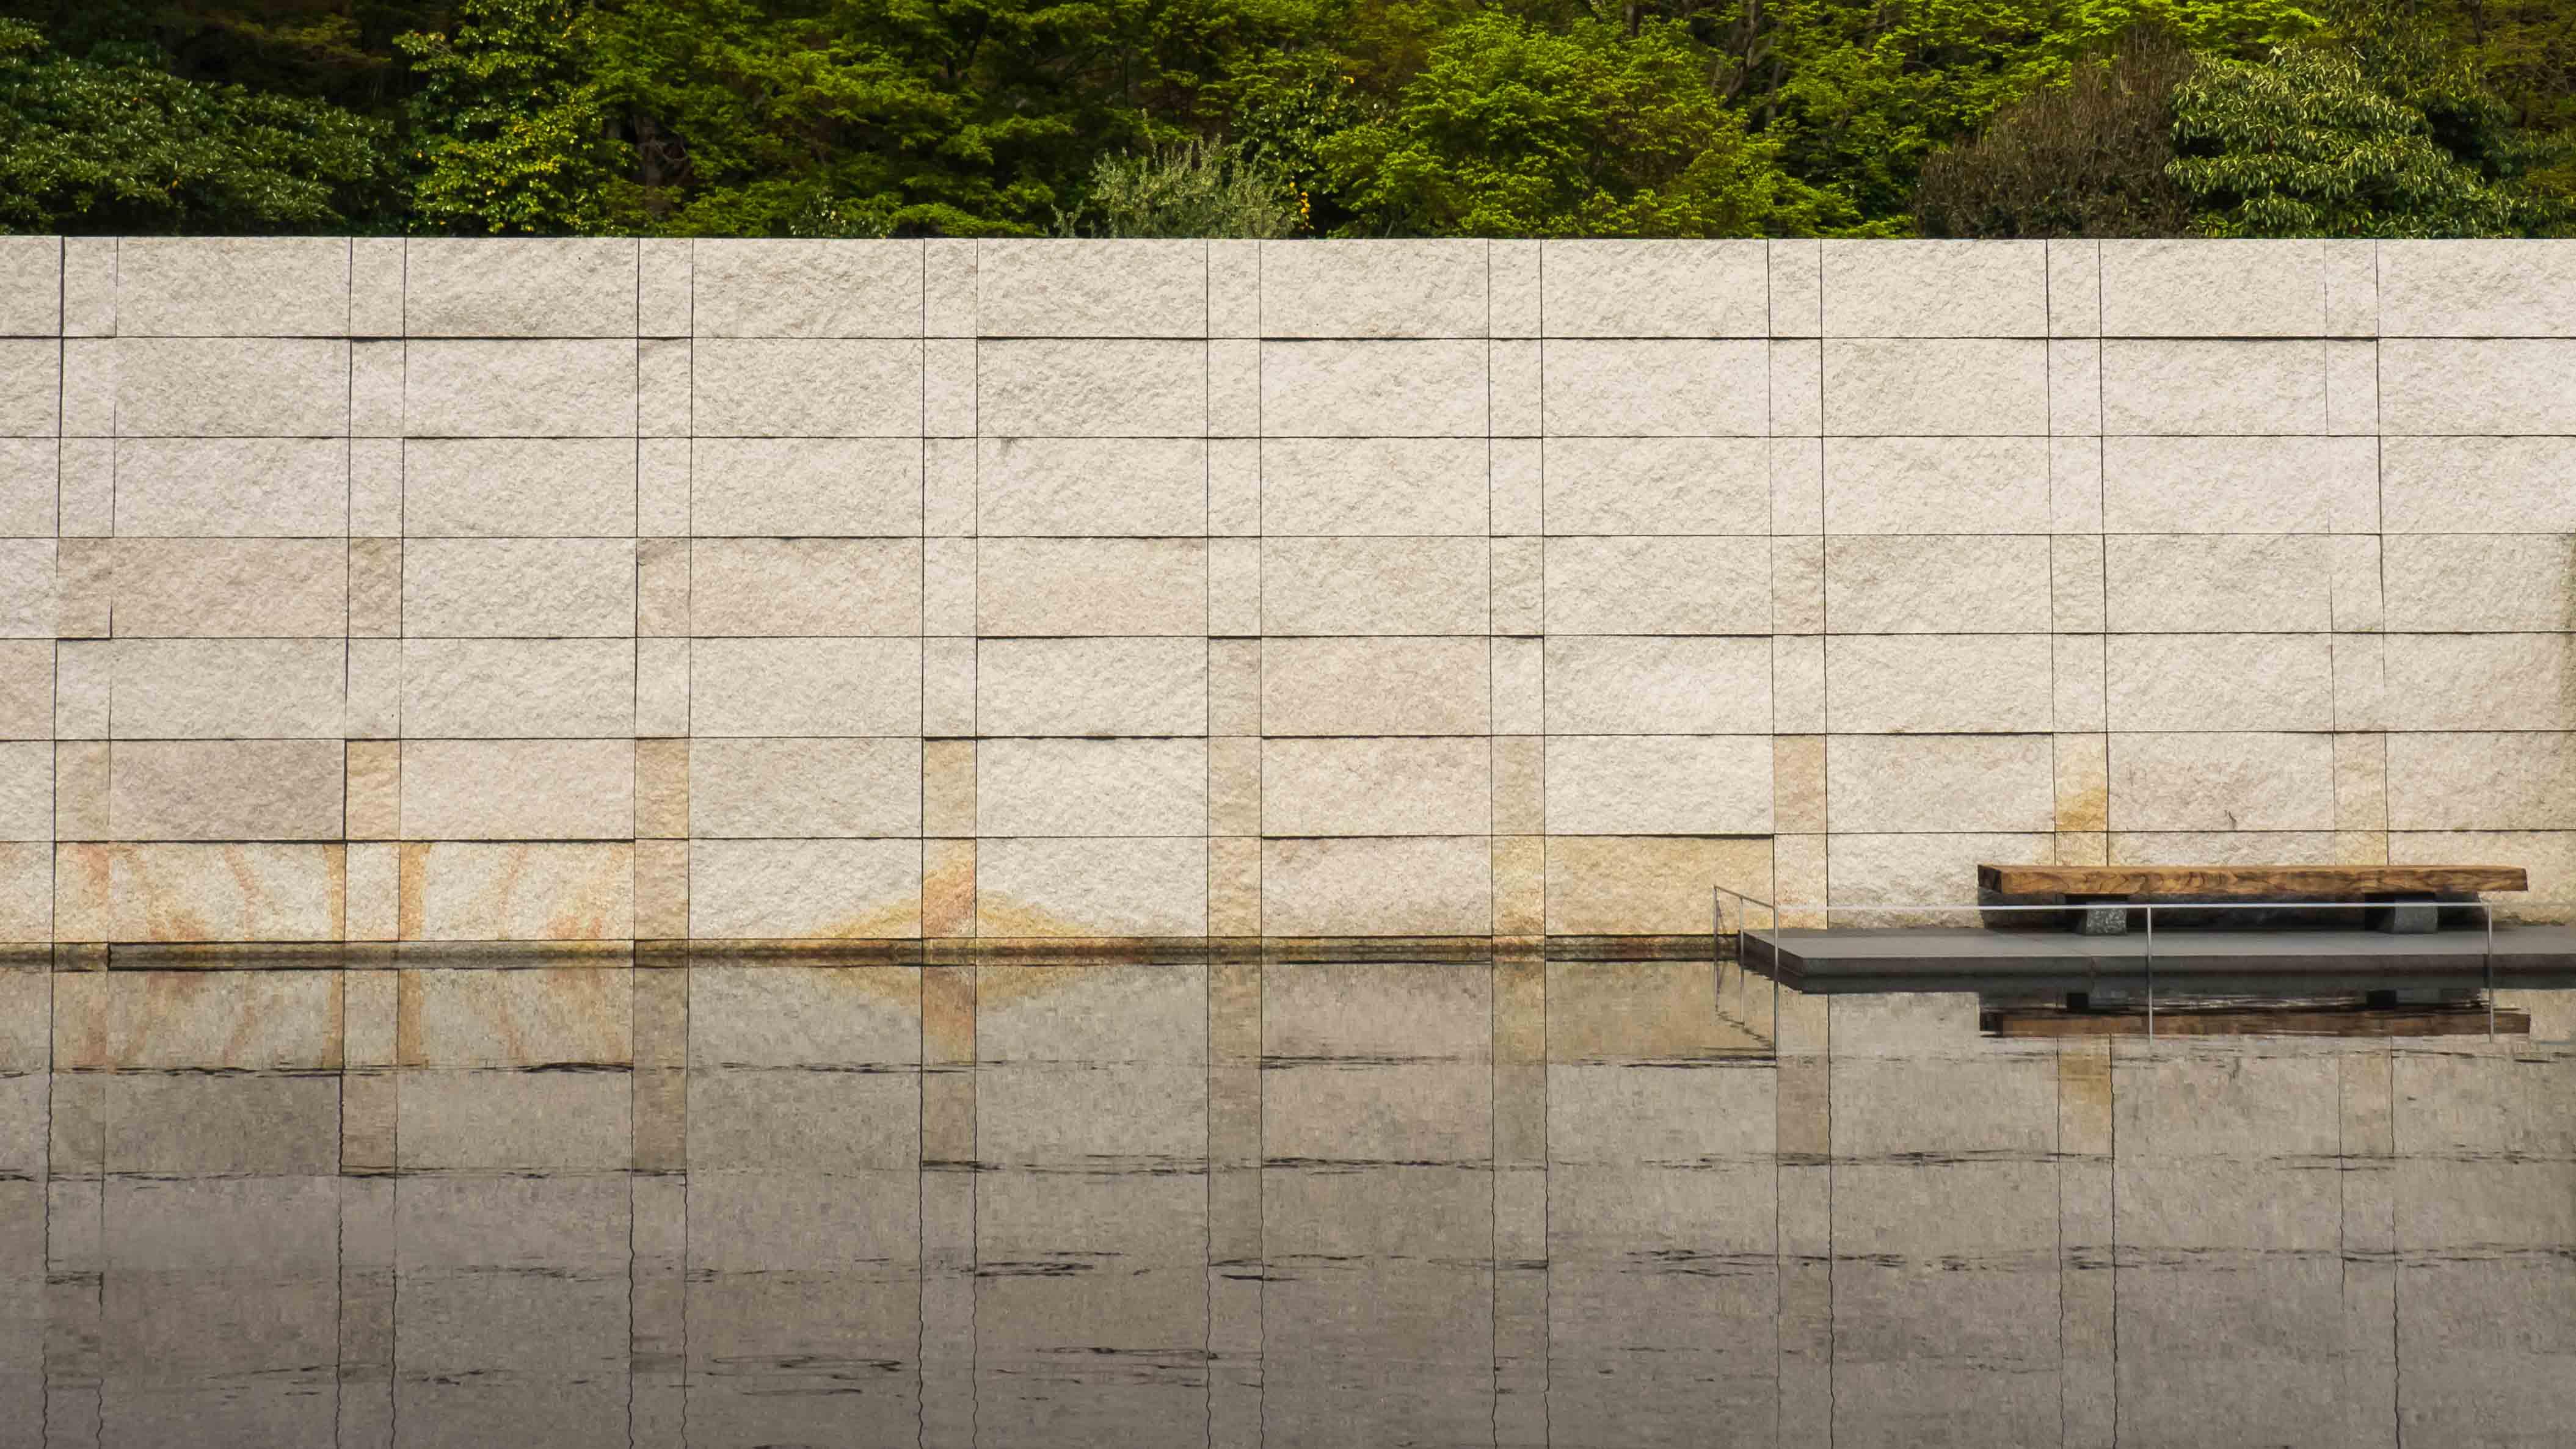 Kanazawa, le plaisir de l'errance